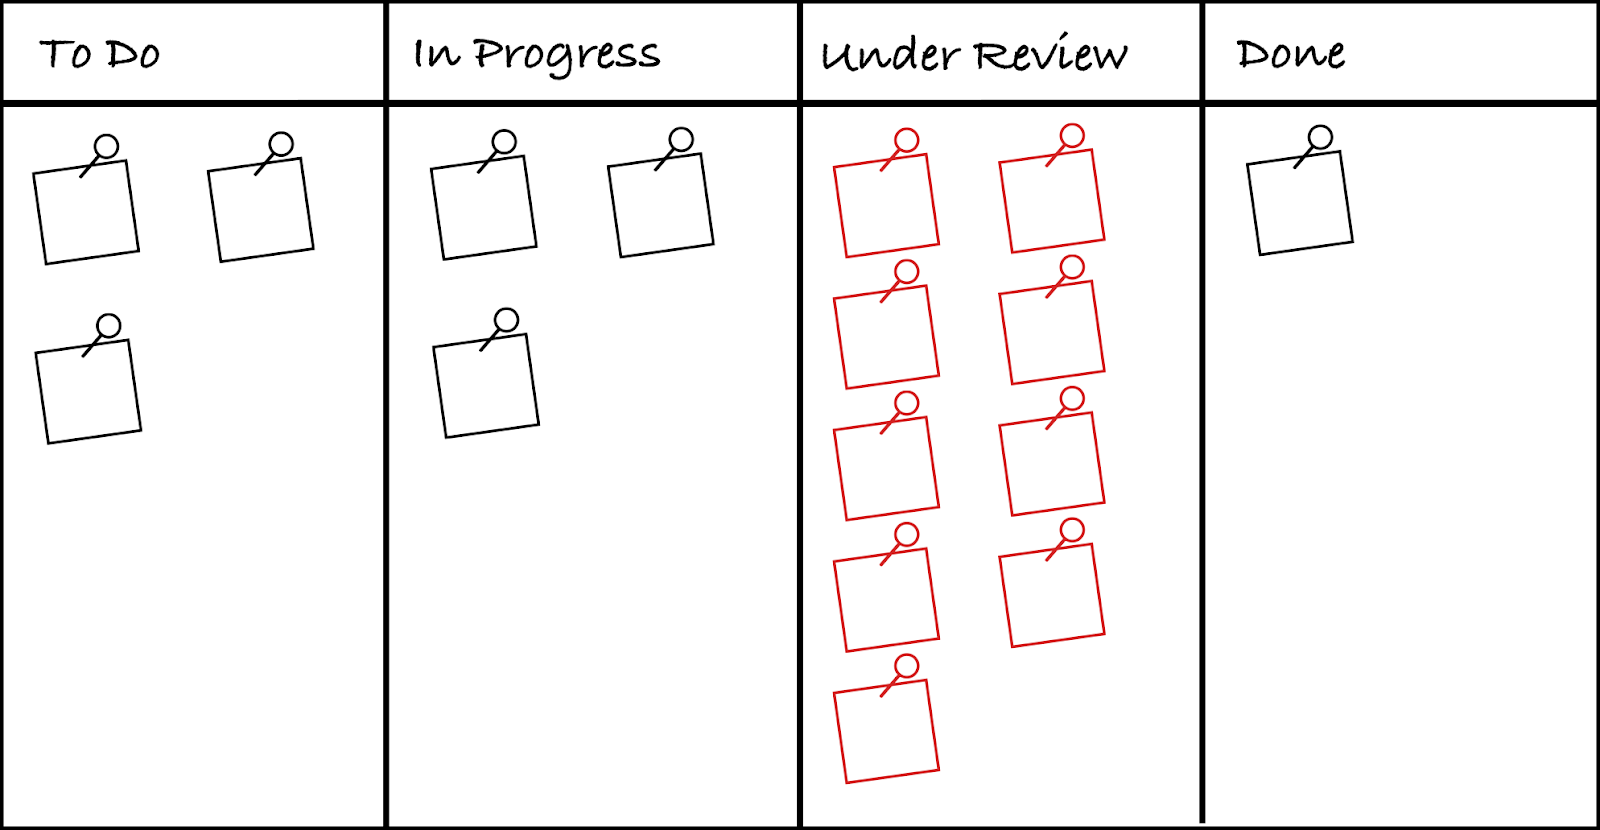 spot the bottlenecks of a project on the board